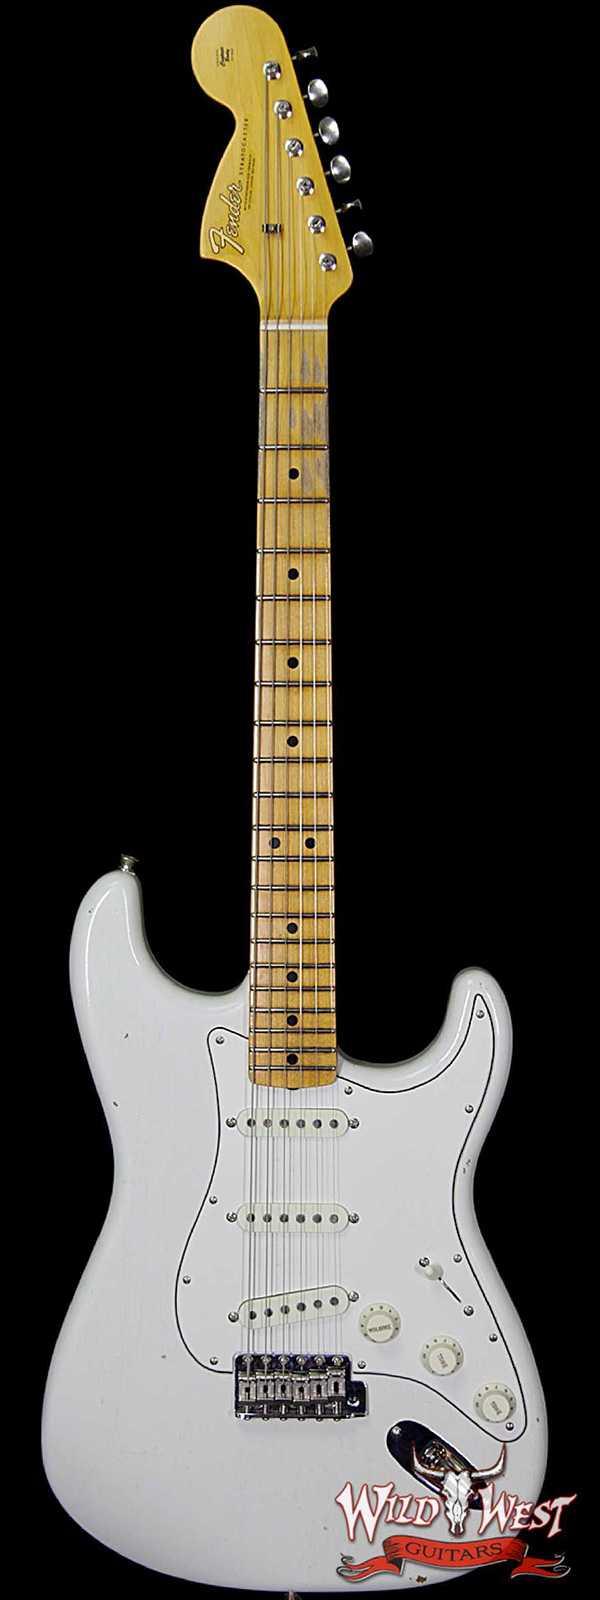 Fender Custom Shop Jimi Hendrix Voodoo Child Signature Stratocaster Journeyman Relic Olympic White VC0480